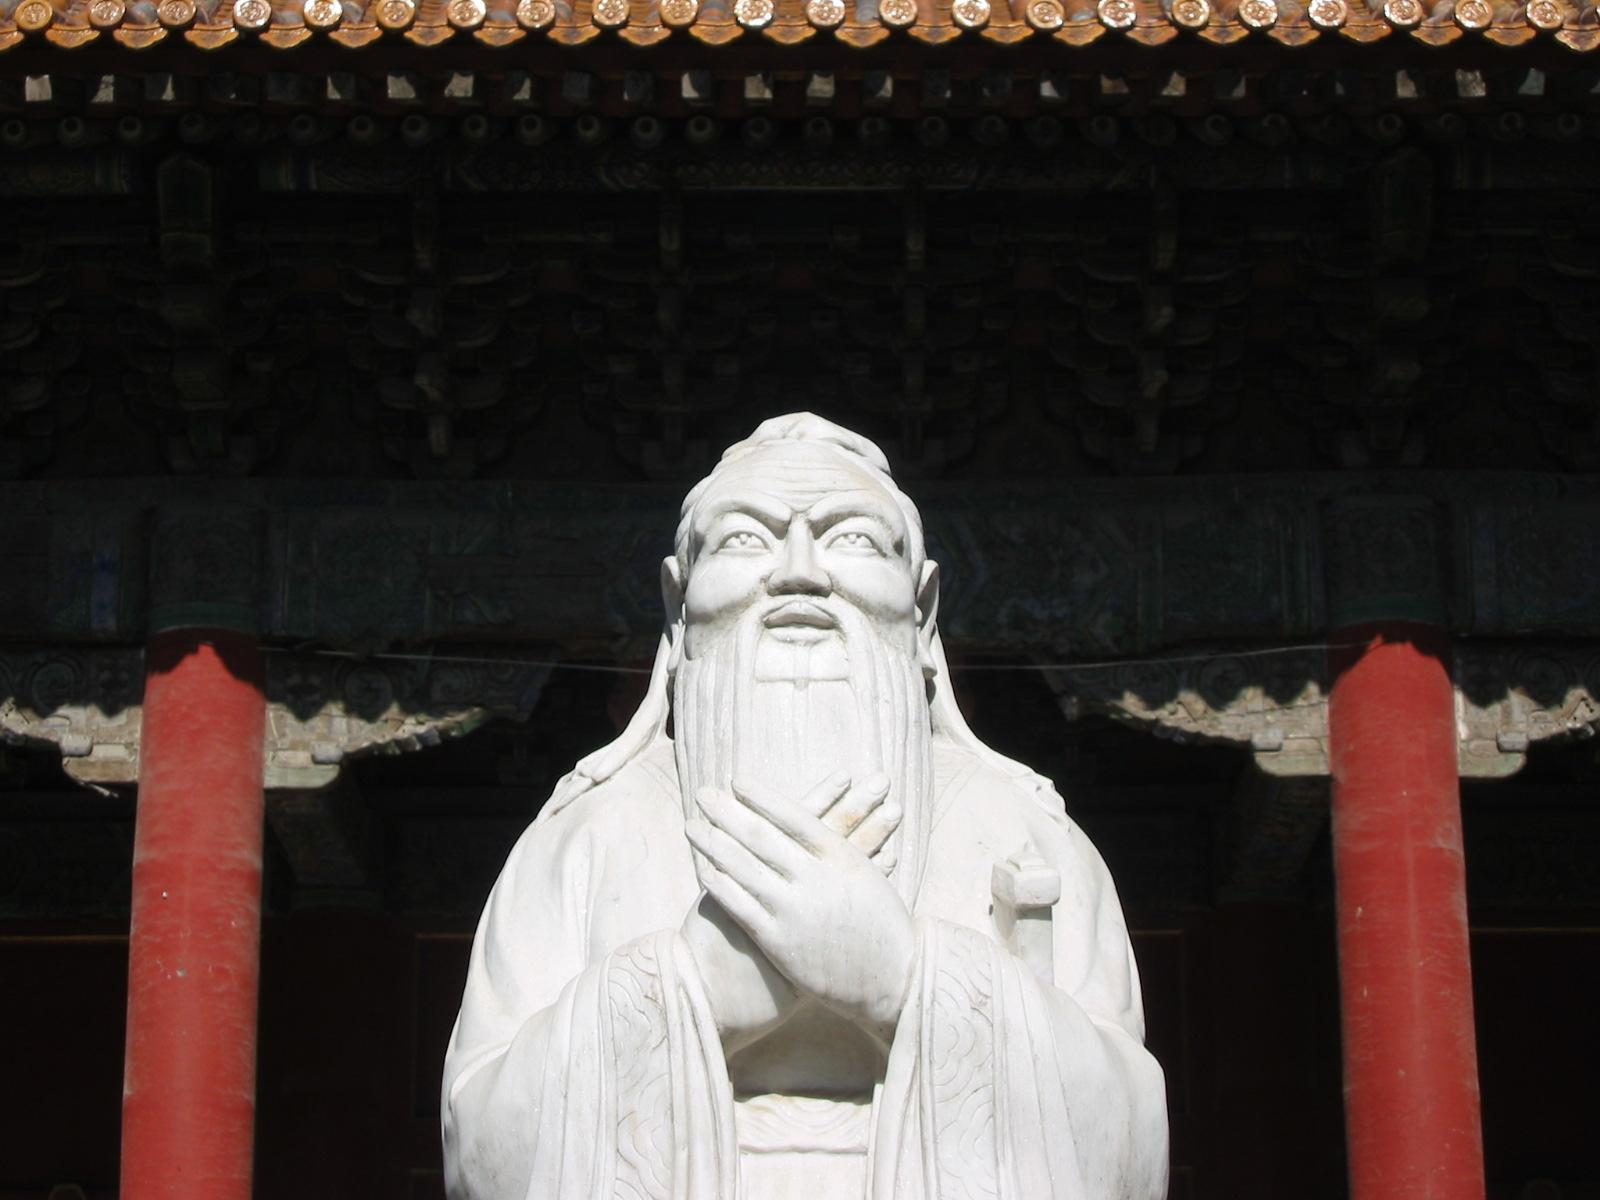 Файл:Confucius statue in beijing.jpg